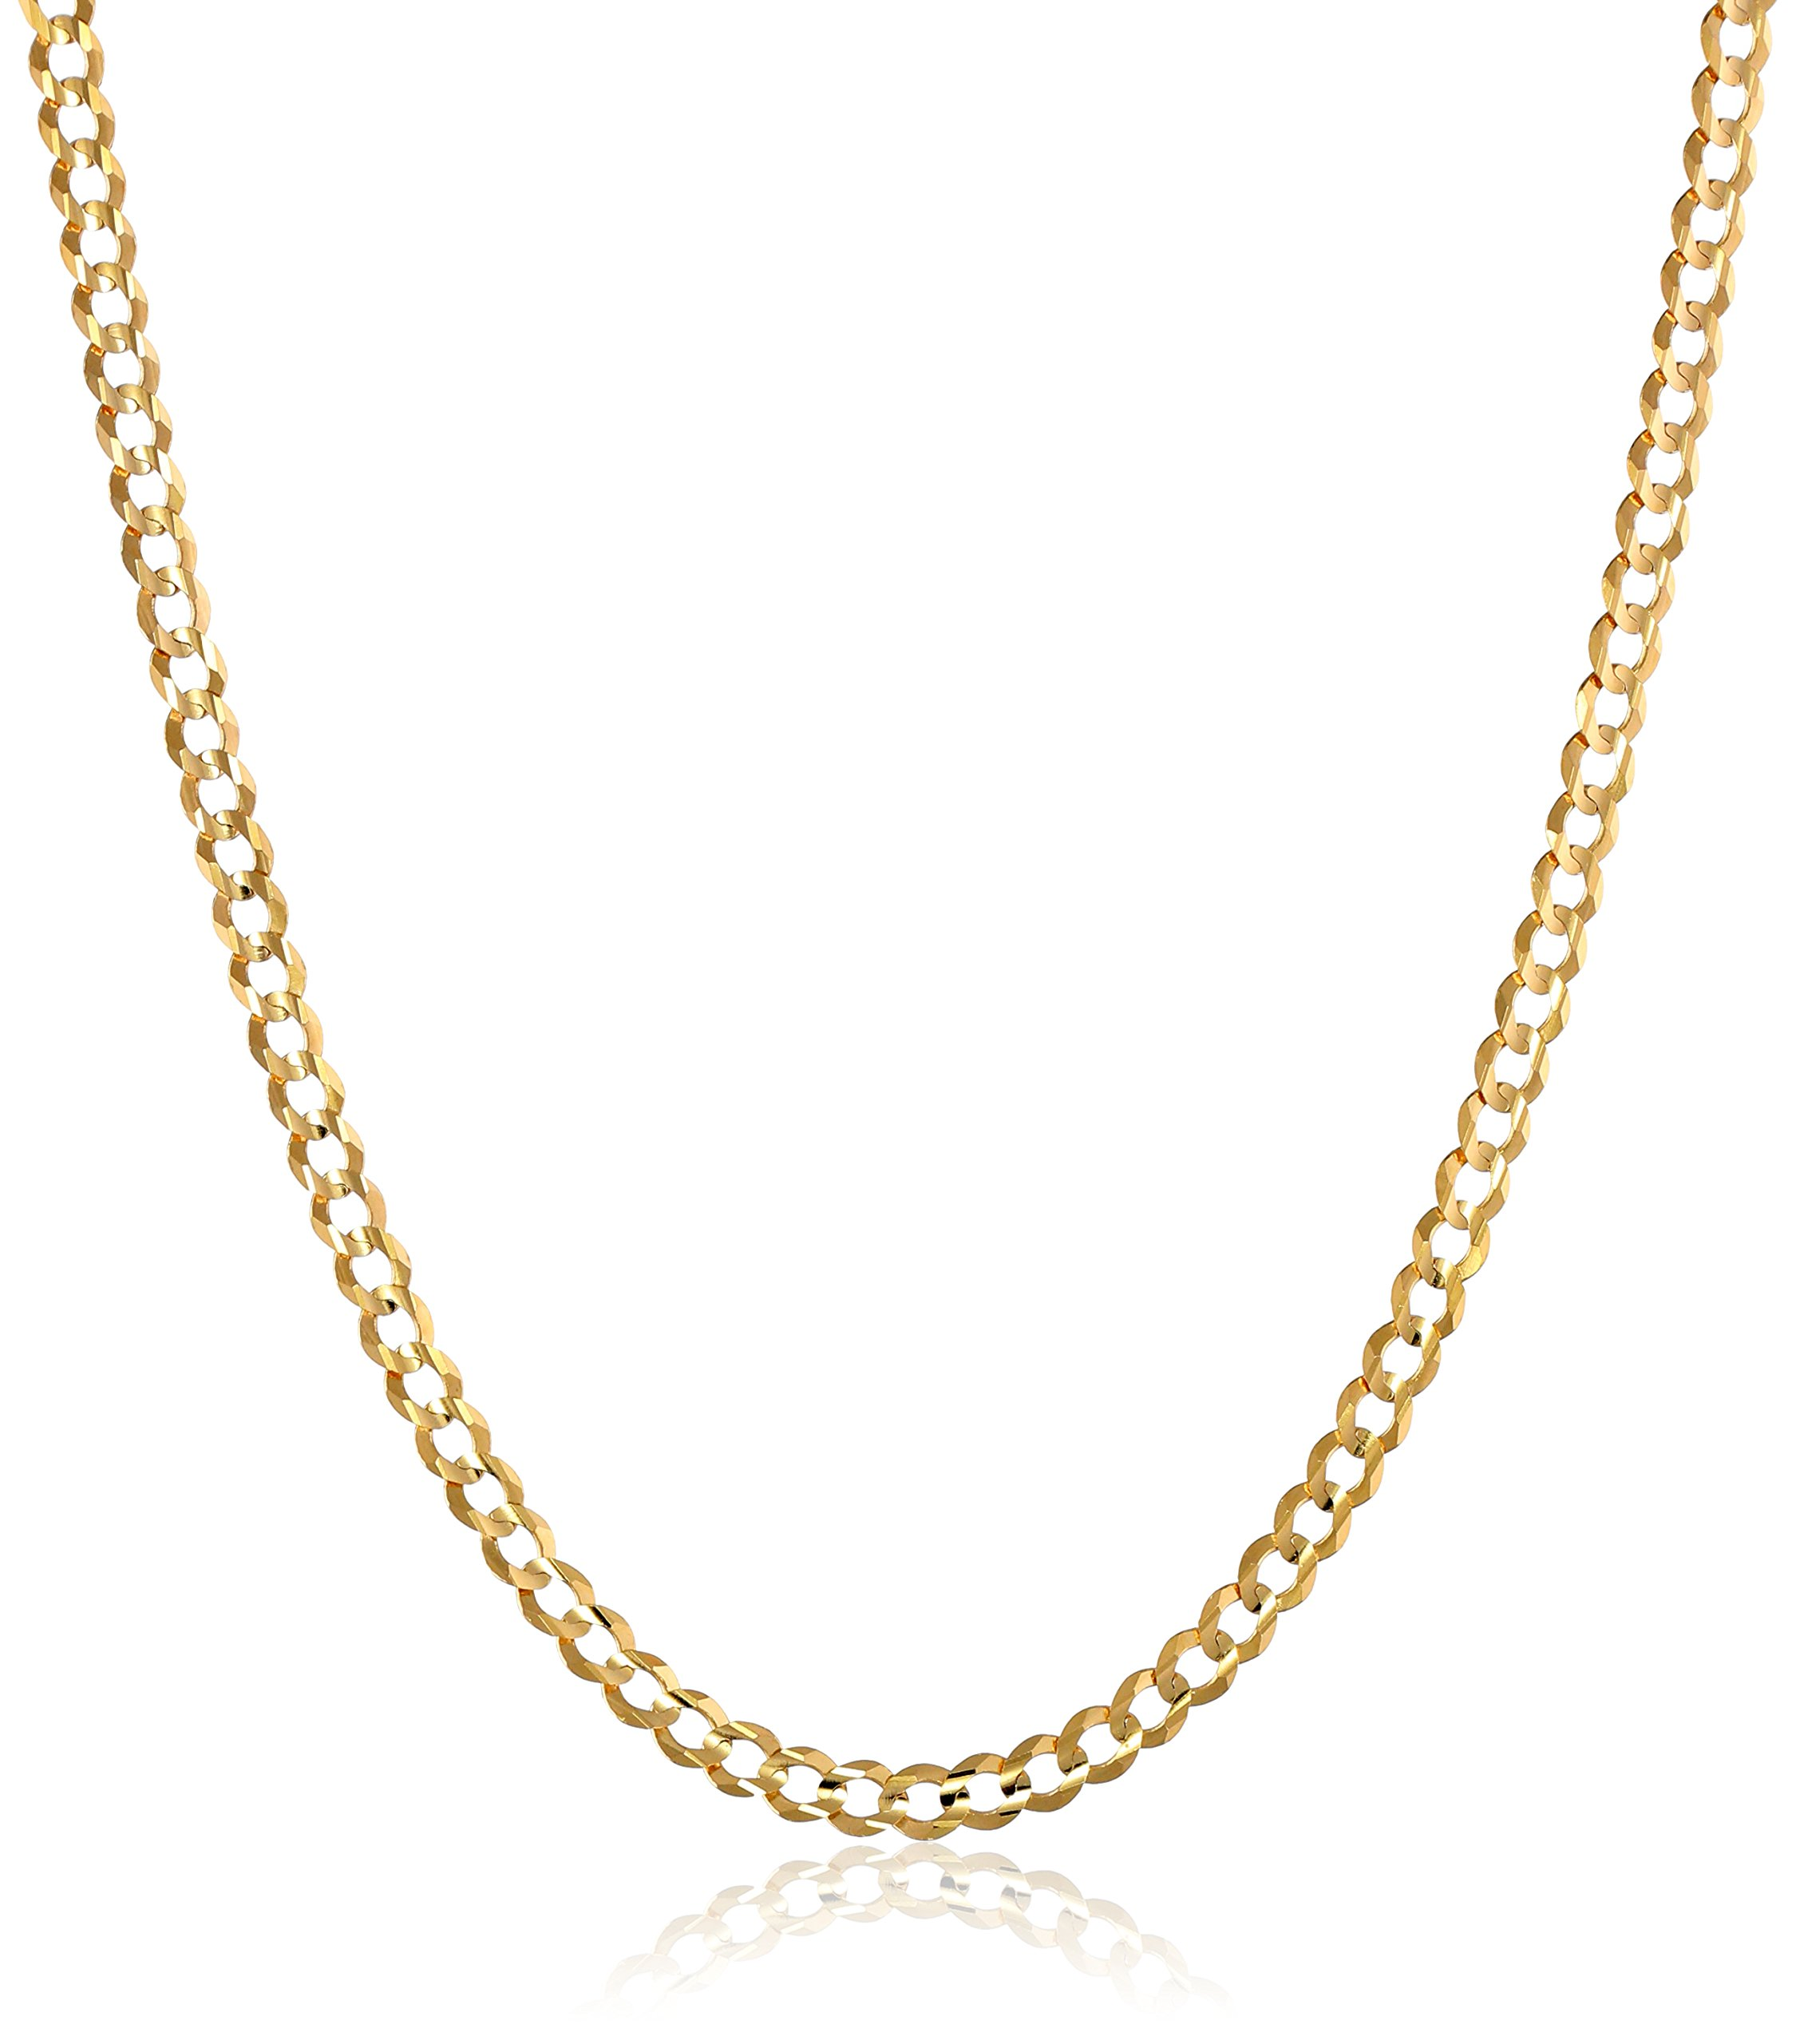 Men's 14k Yellow Gold 3.85mm Cuban Chain Necklace, 24''